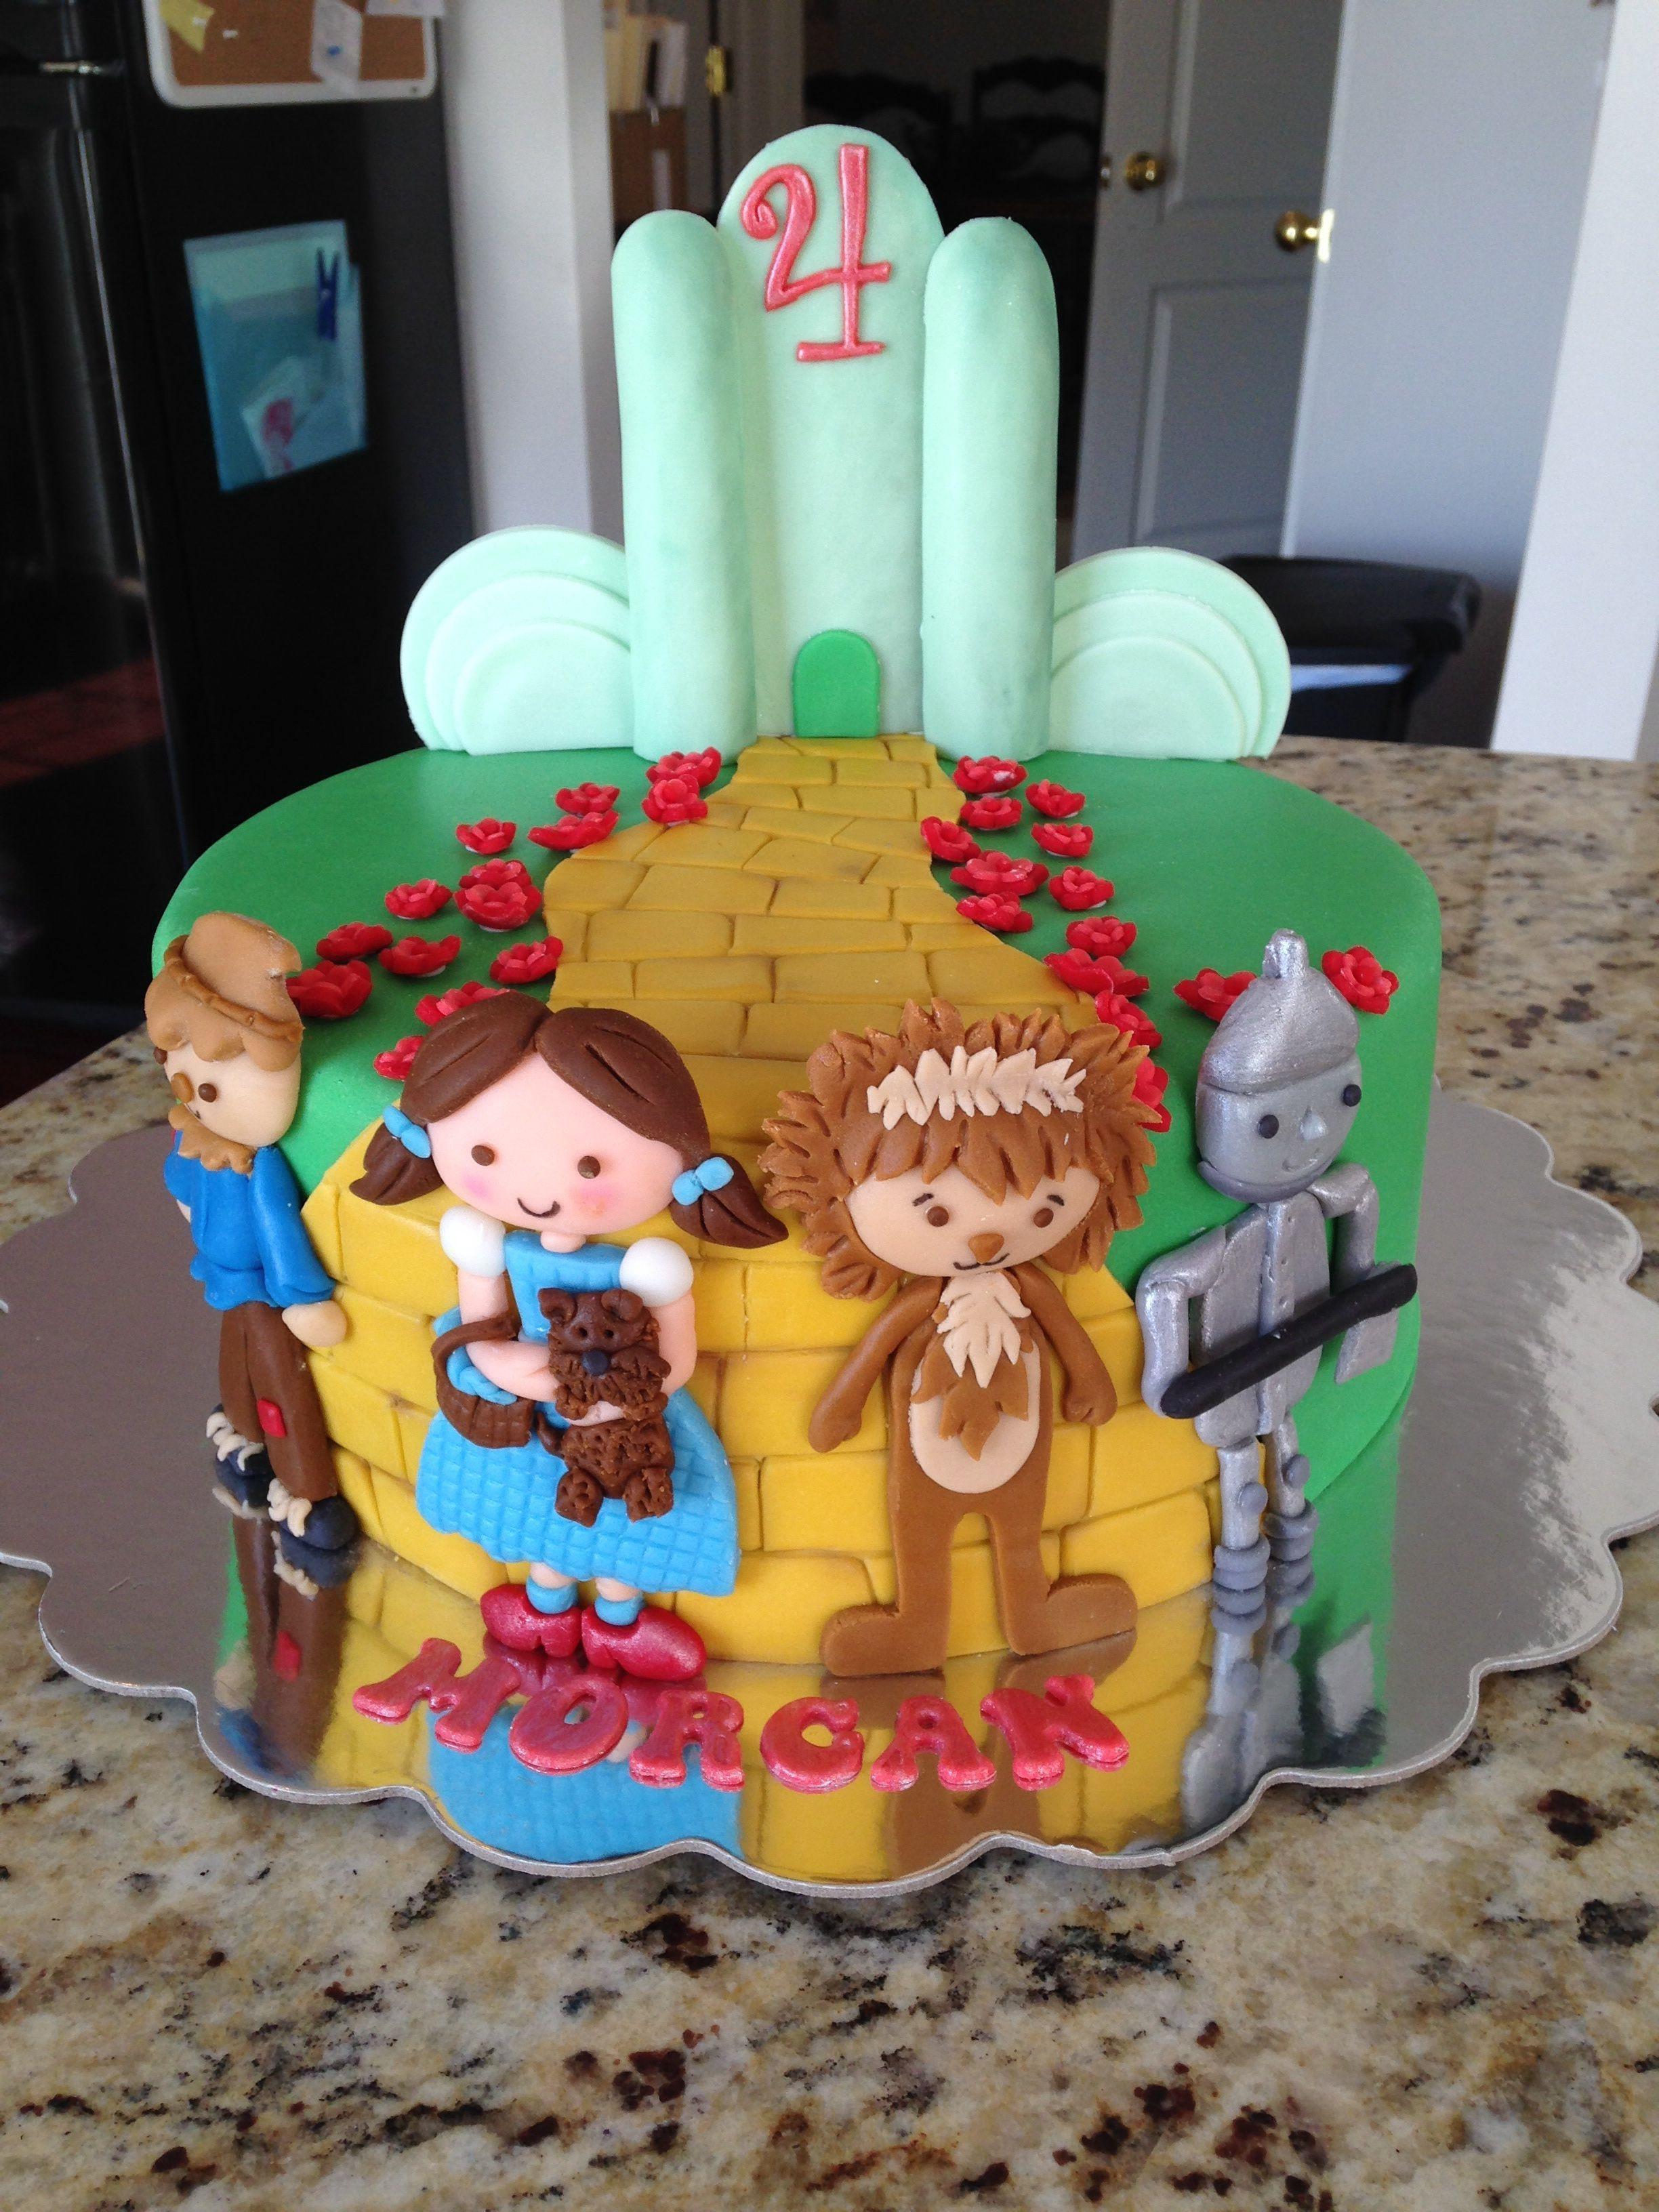 Wizard Of Oz Cake Decorating Kit : Wizard of Oz Cakes Pinterest Dr. oz, Cakes and Cake ...